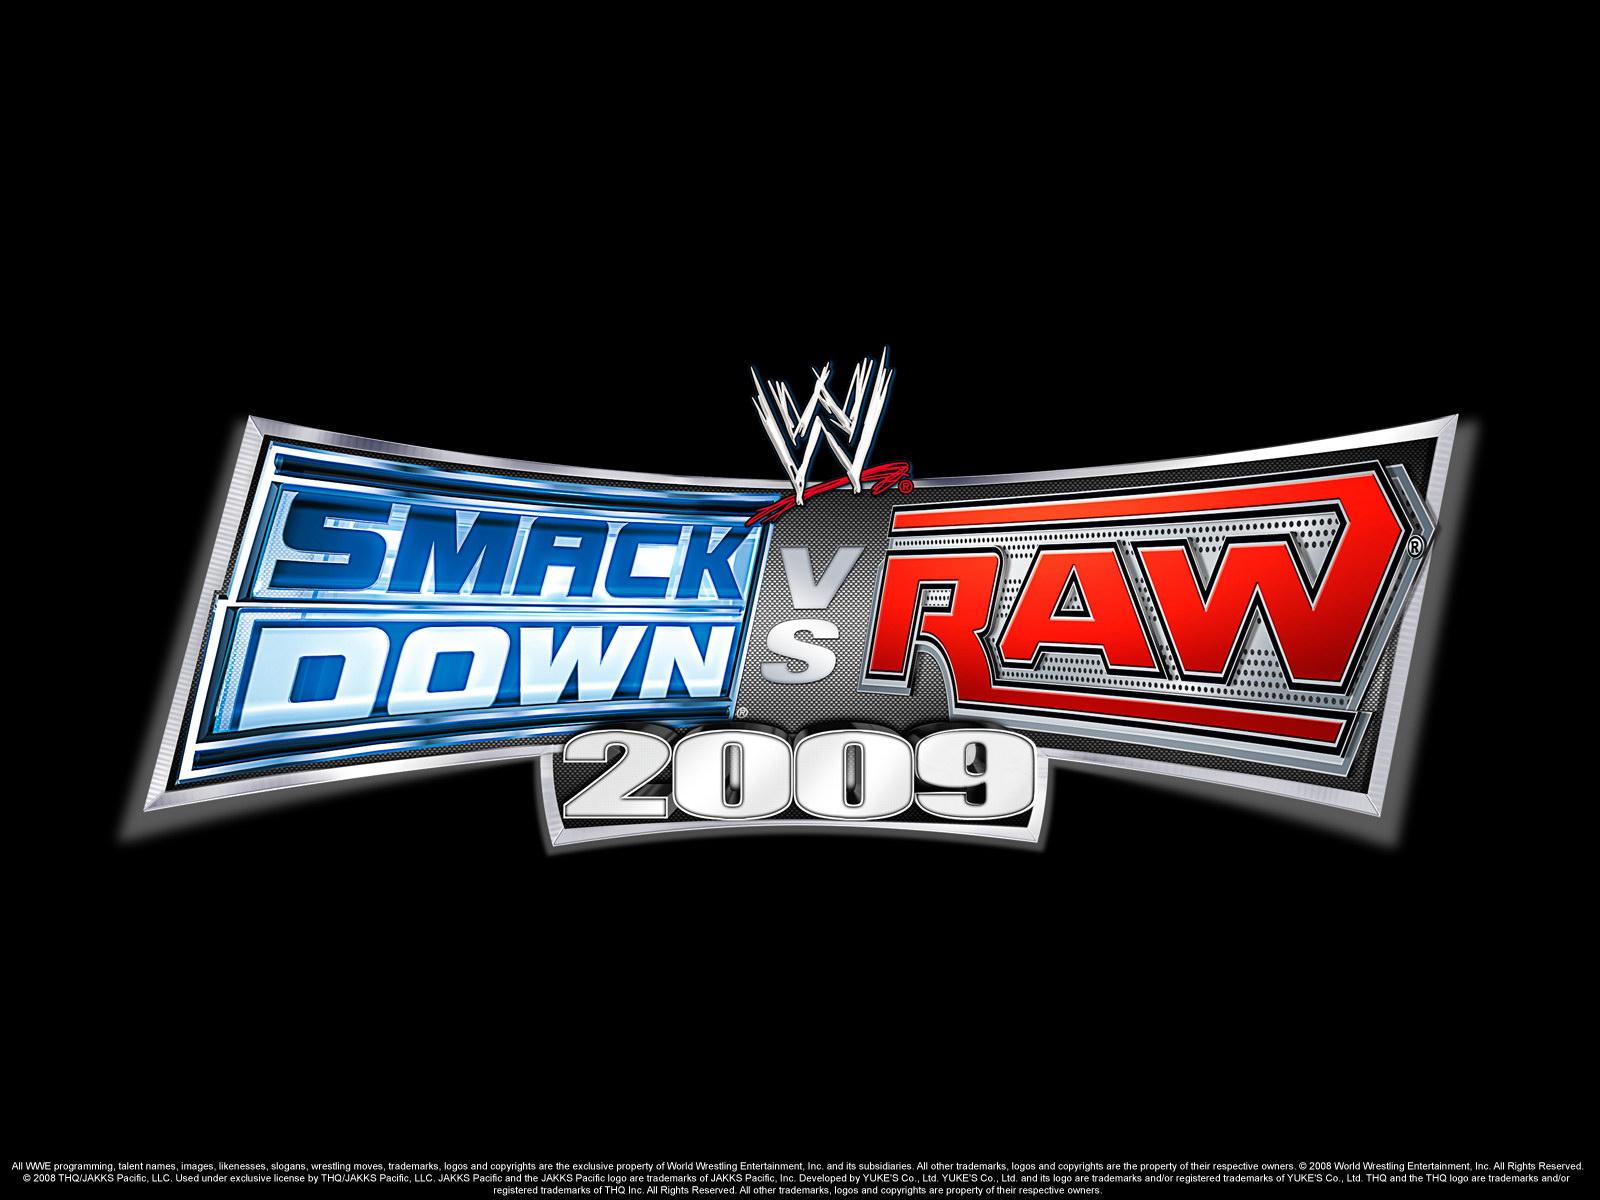 WWE WALLPAPERS wwe logo wallpaper wwe logo images wwe logo pics 1600x1200